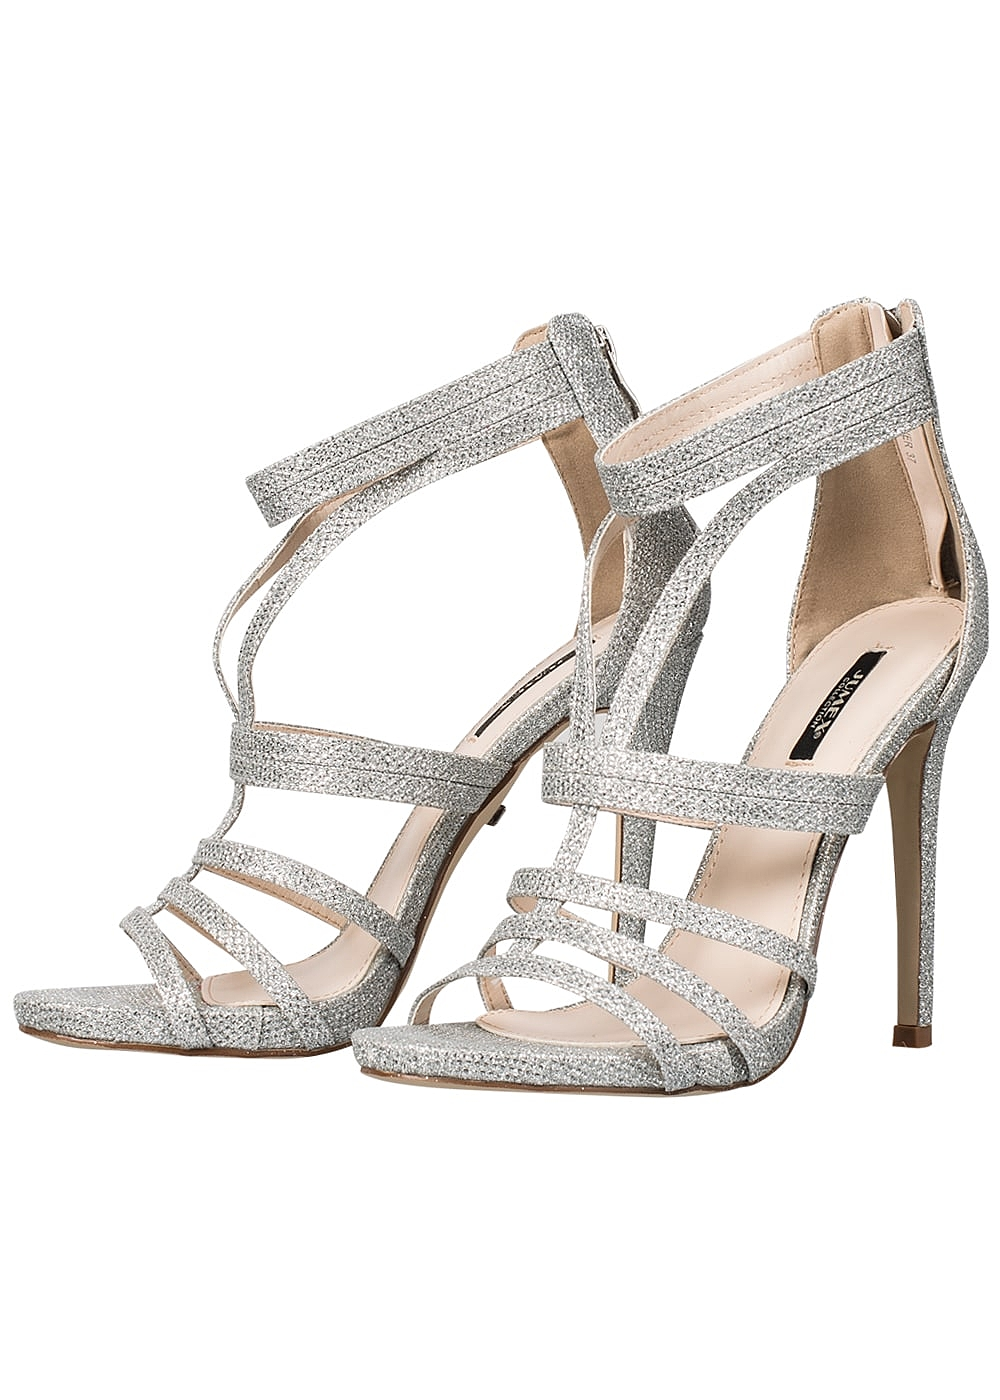 4e34b411c05f8a Seventyseven Lifestyle Schuh Damen Stiletto Sandalette Absatz 12cm ...